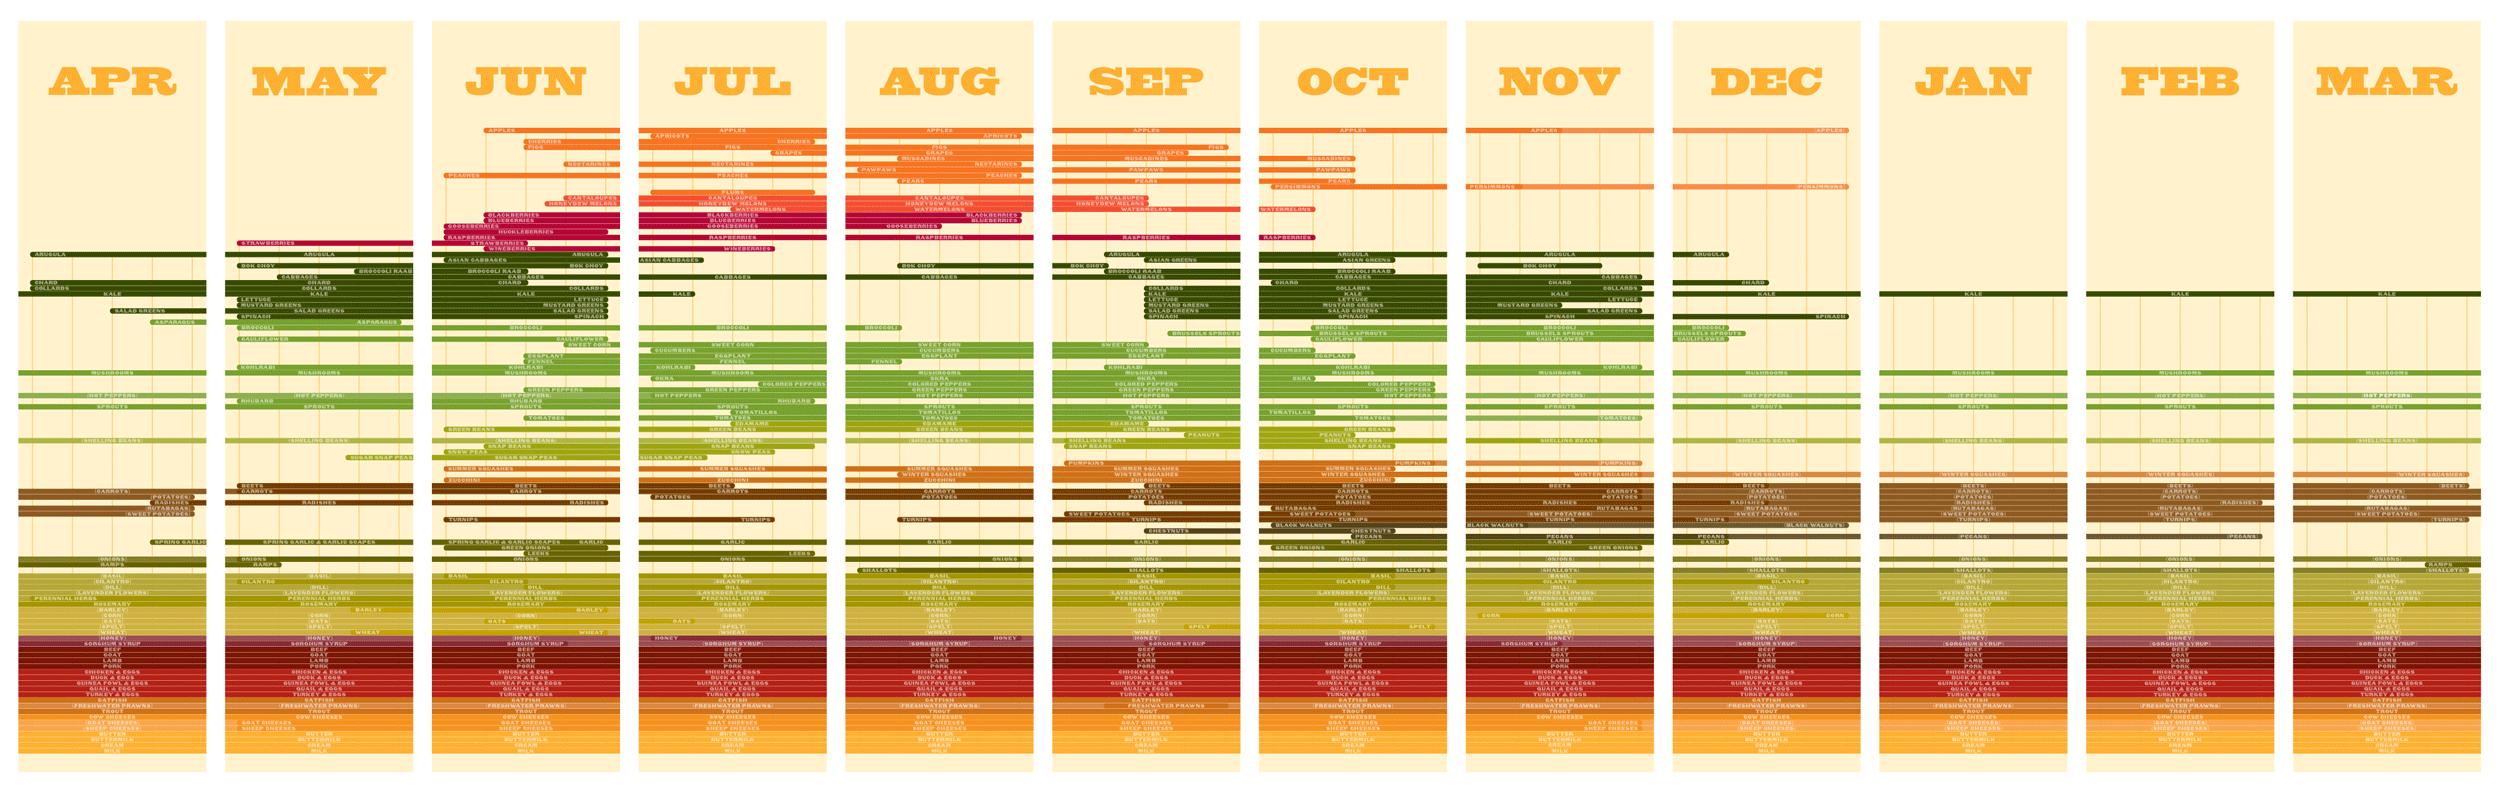 seasonal calendar of local foods